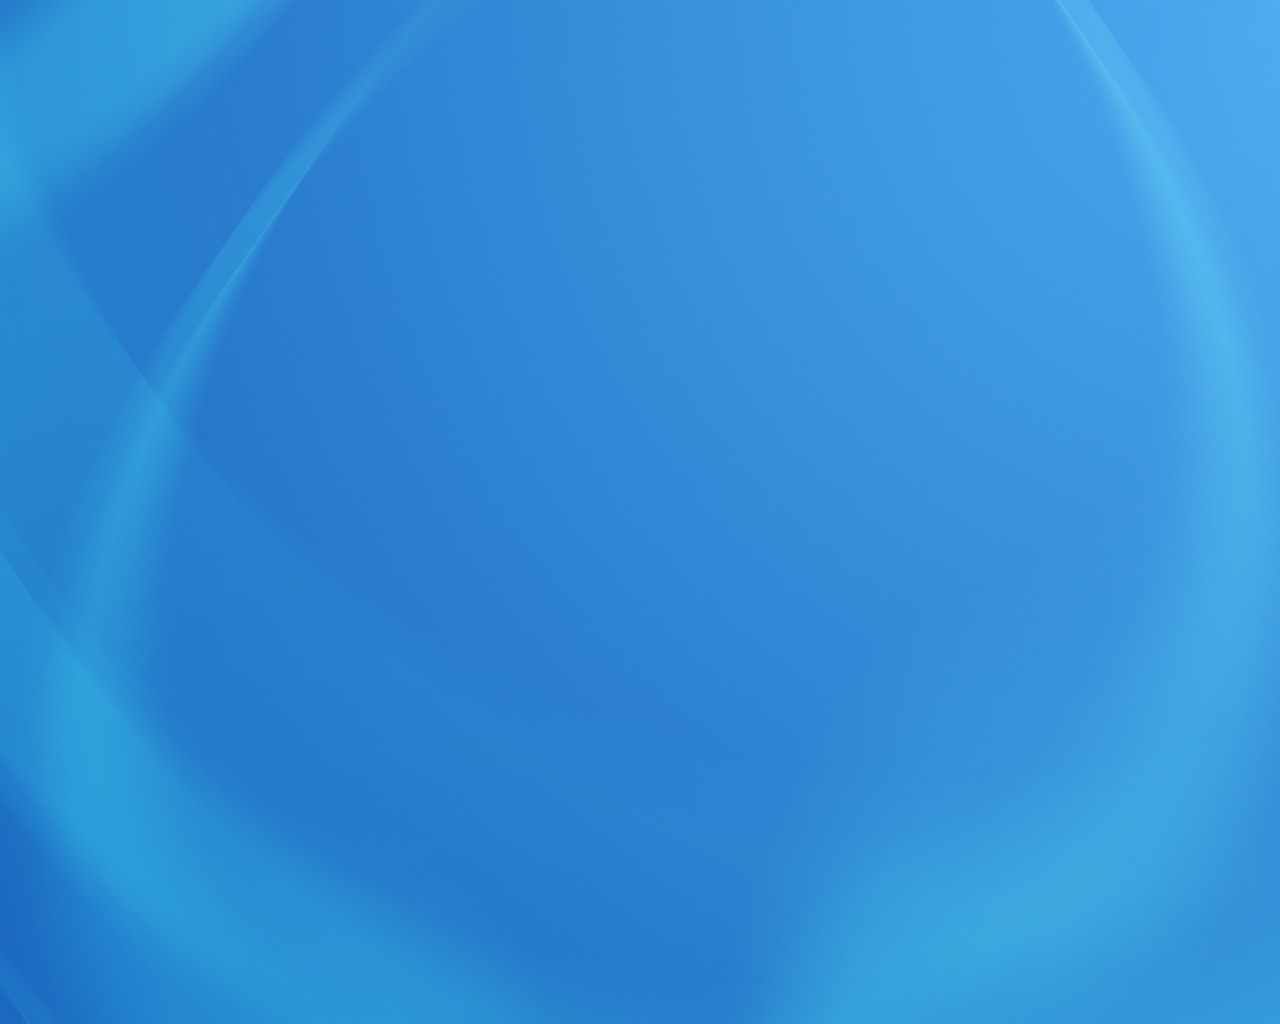 BlueCrystal4_blue